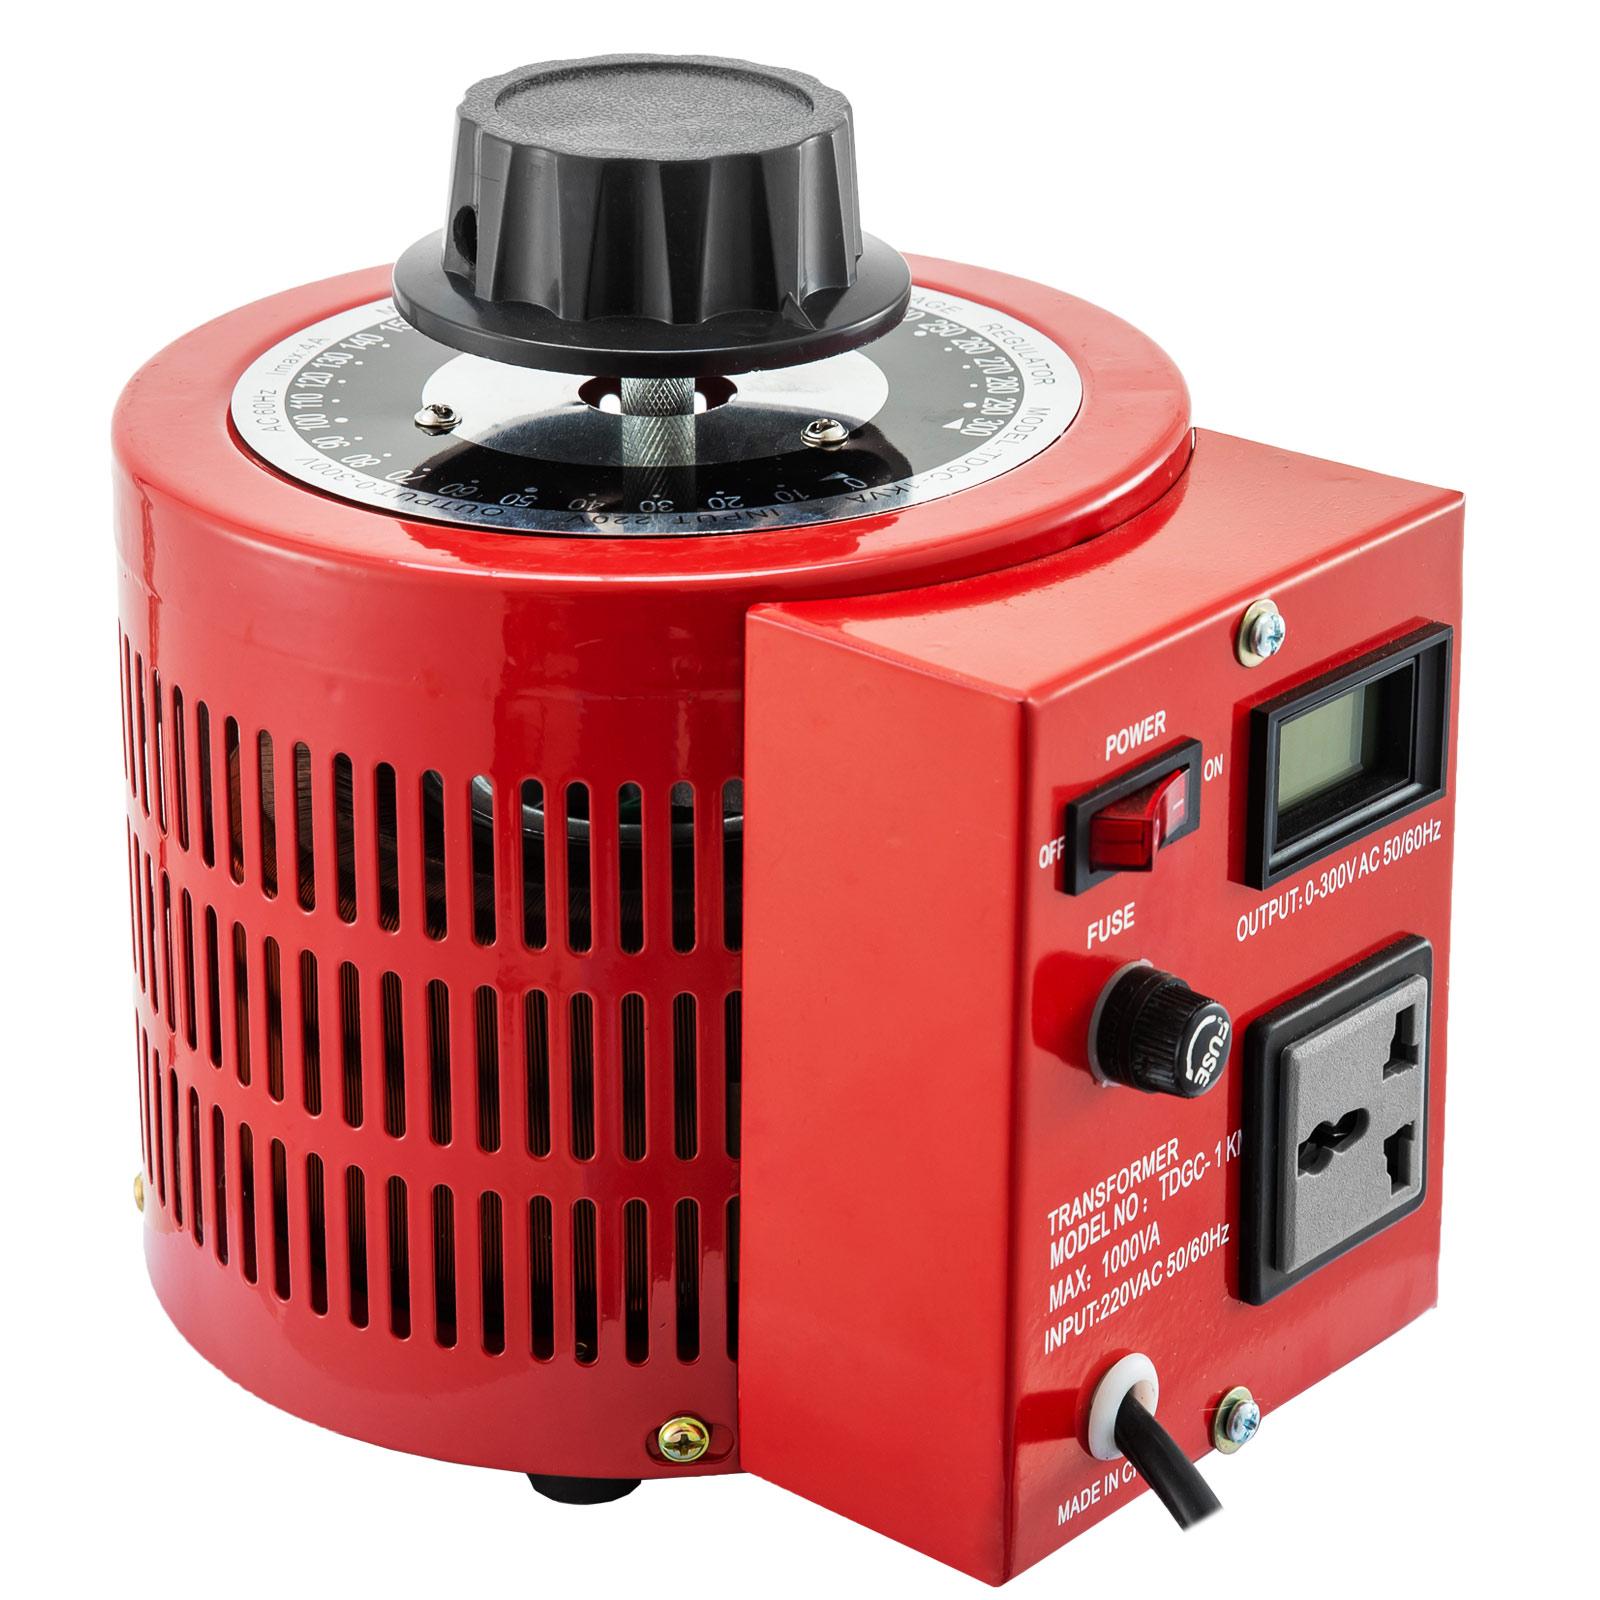 Auto-Variac-Variable-Transformer-0-5-1-2-3KVA-Regulator-pure-copper-coil-220V thumbnail 36